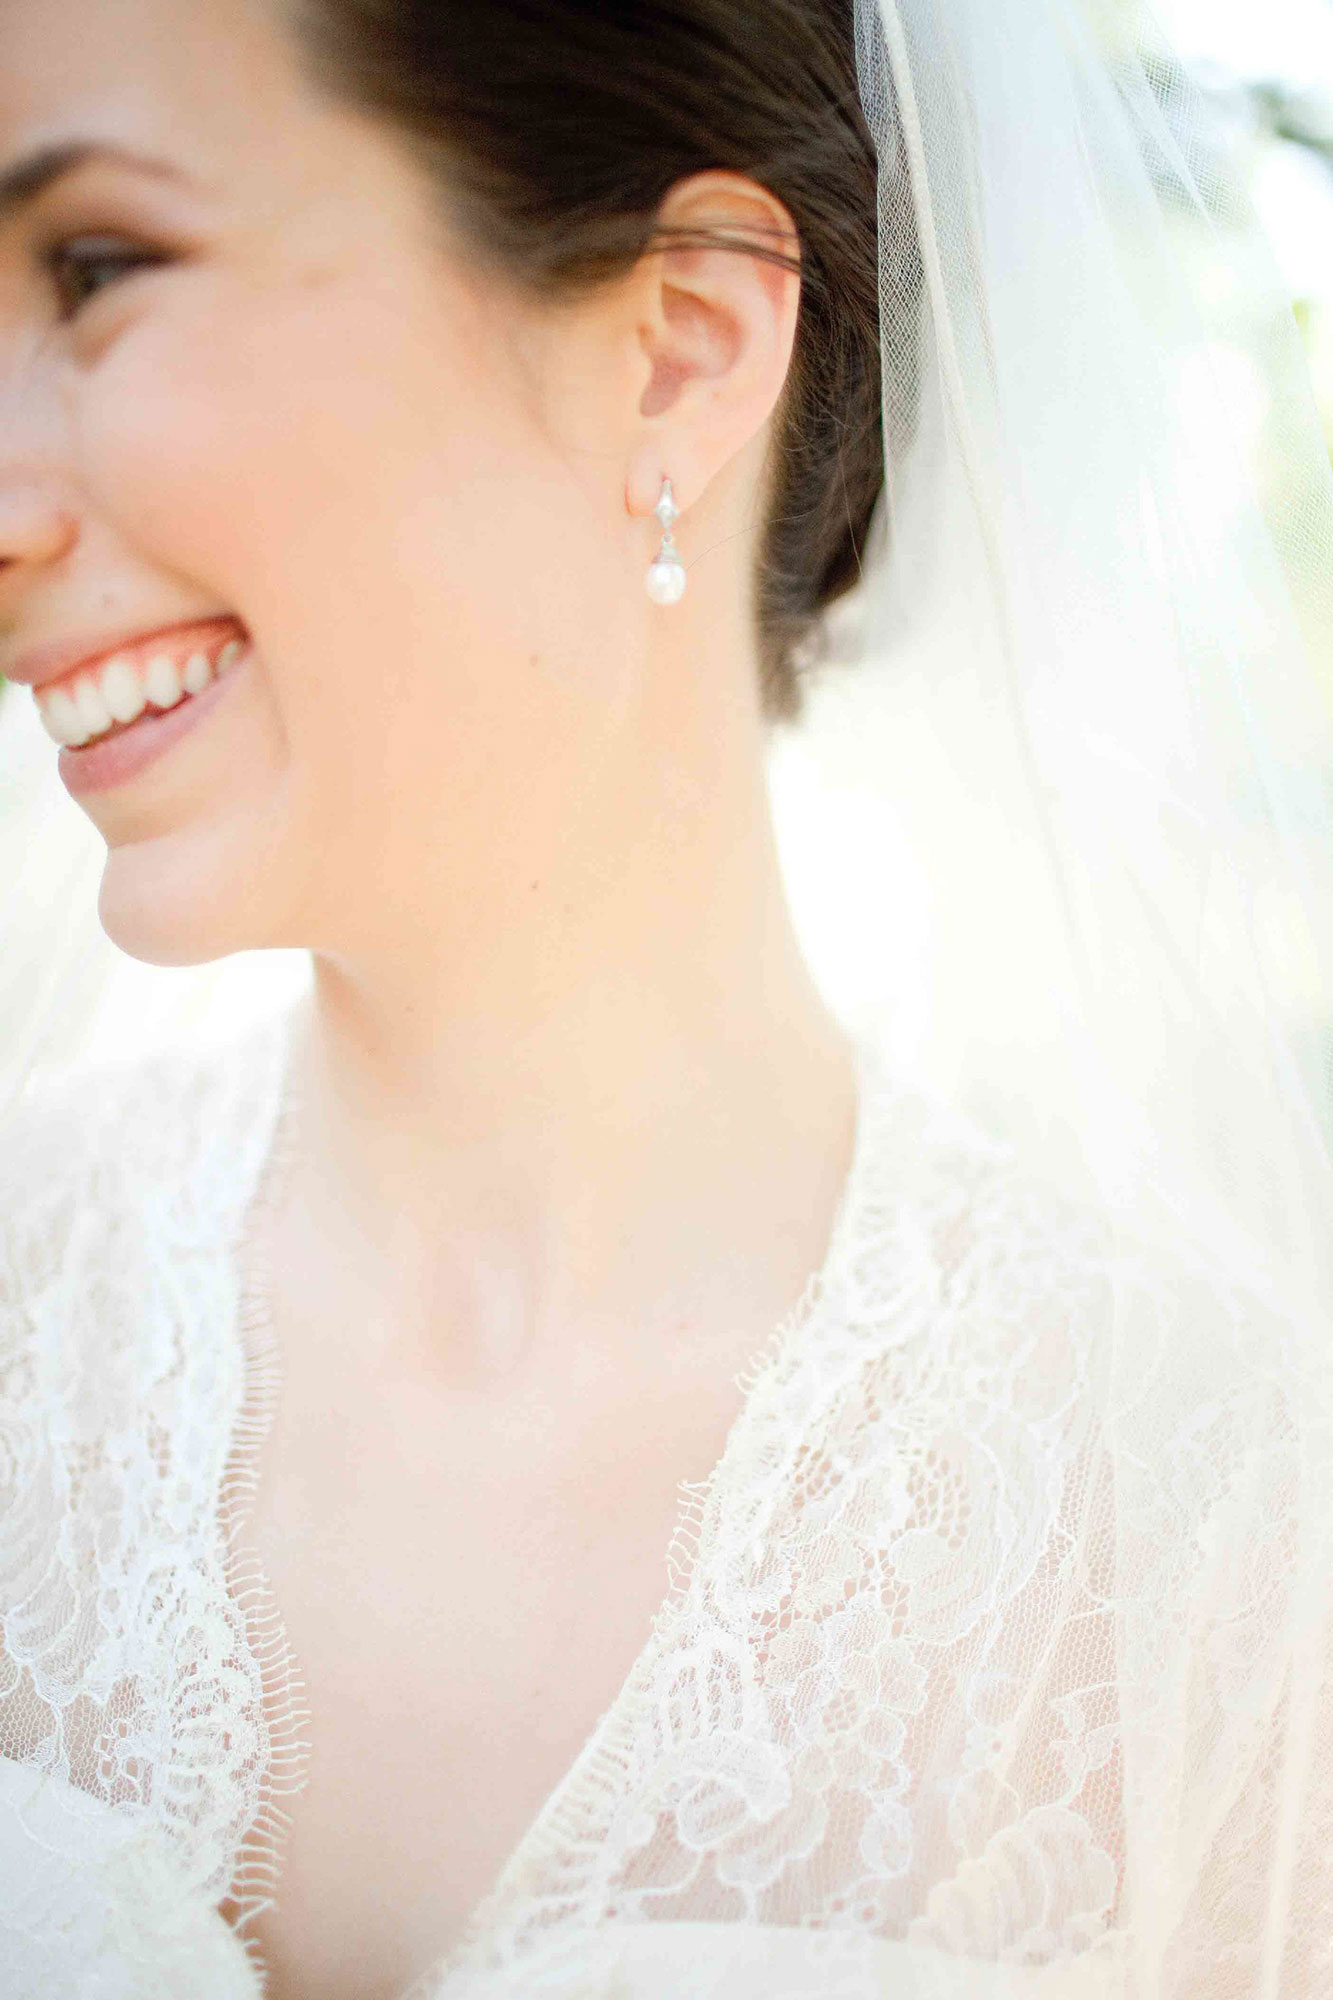 Amanda-Cowley-Willowbank-Vineyard-Bride-Photo-By-White-Photographie-025.jpg